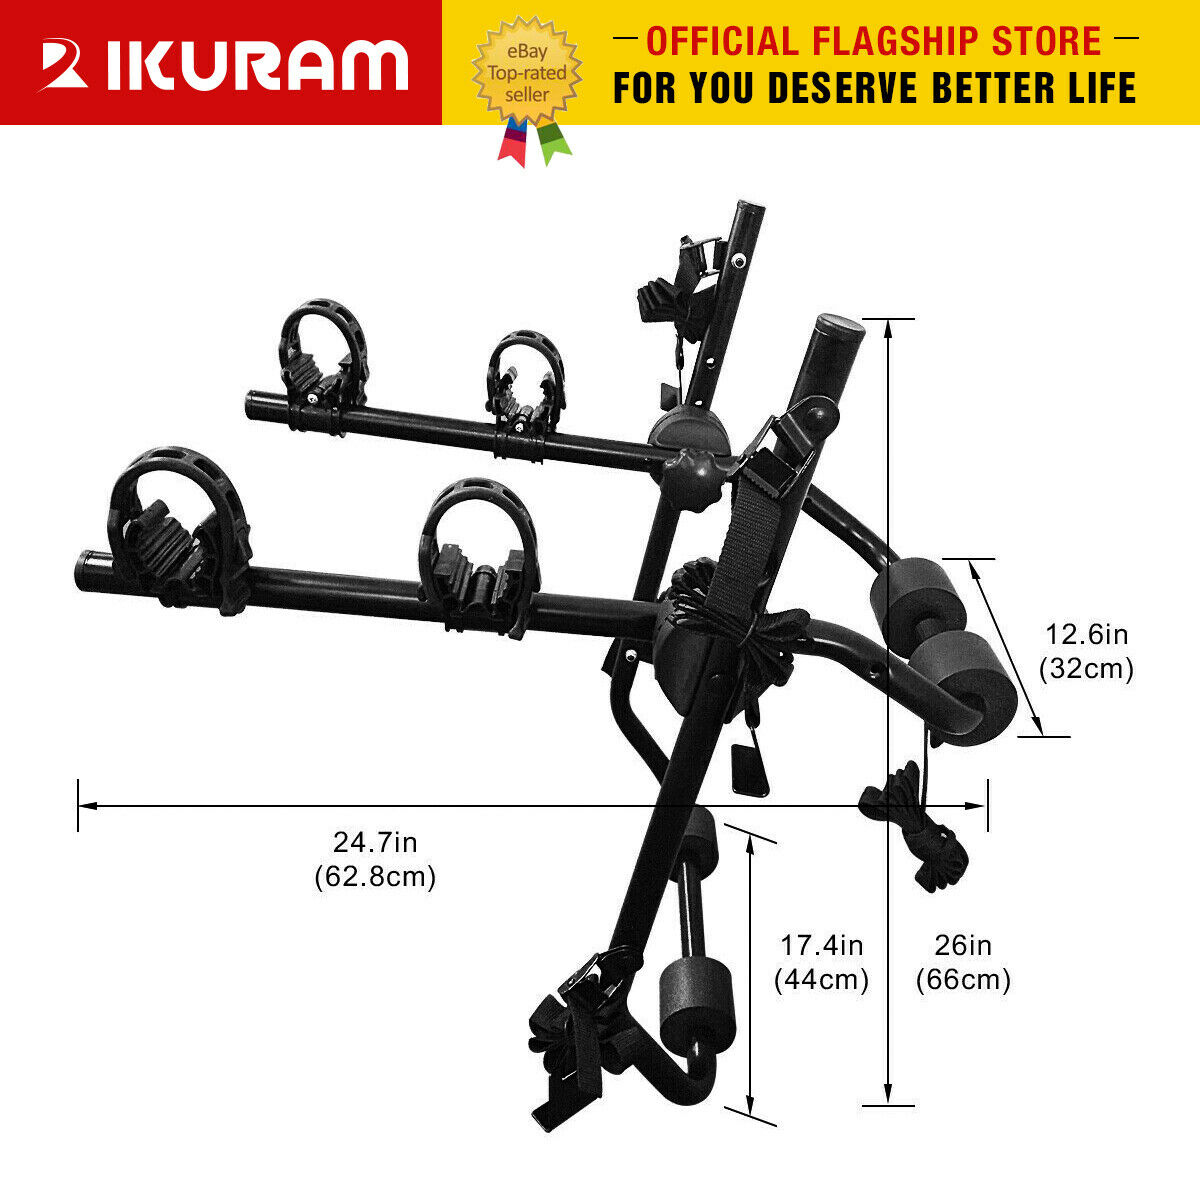 IKURAM 1-5 Bike Bicycle Floor Parking Rack Storage Stand Mount Holder Adjustable